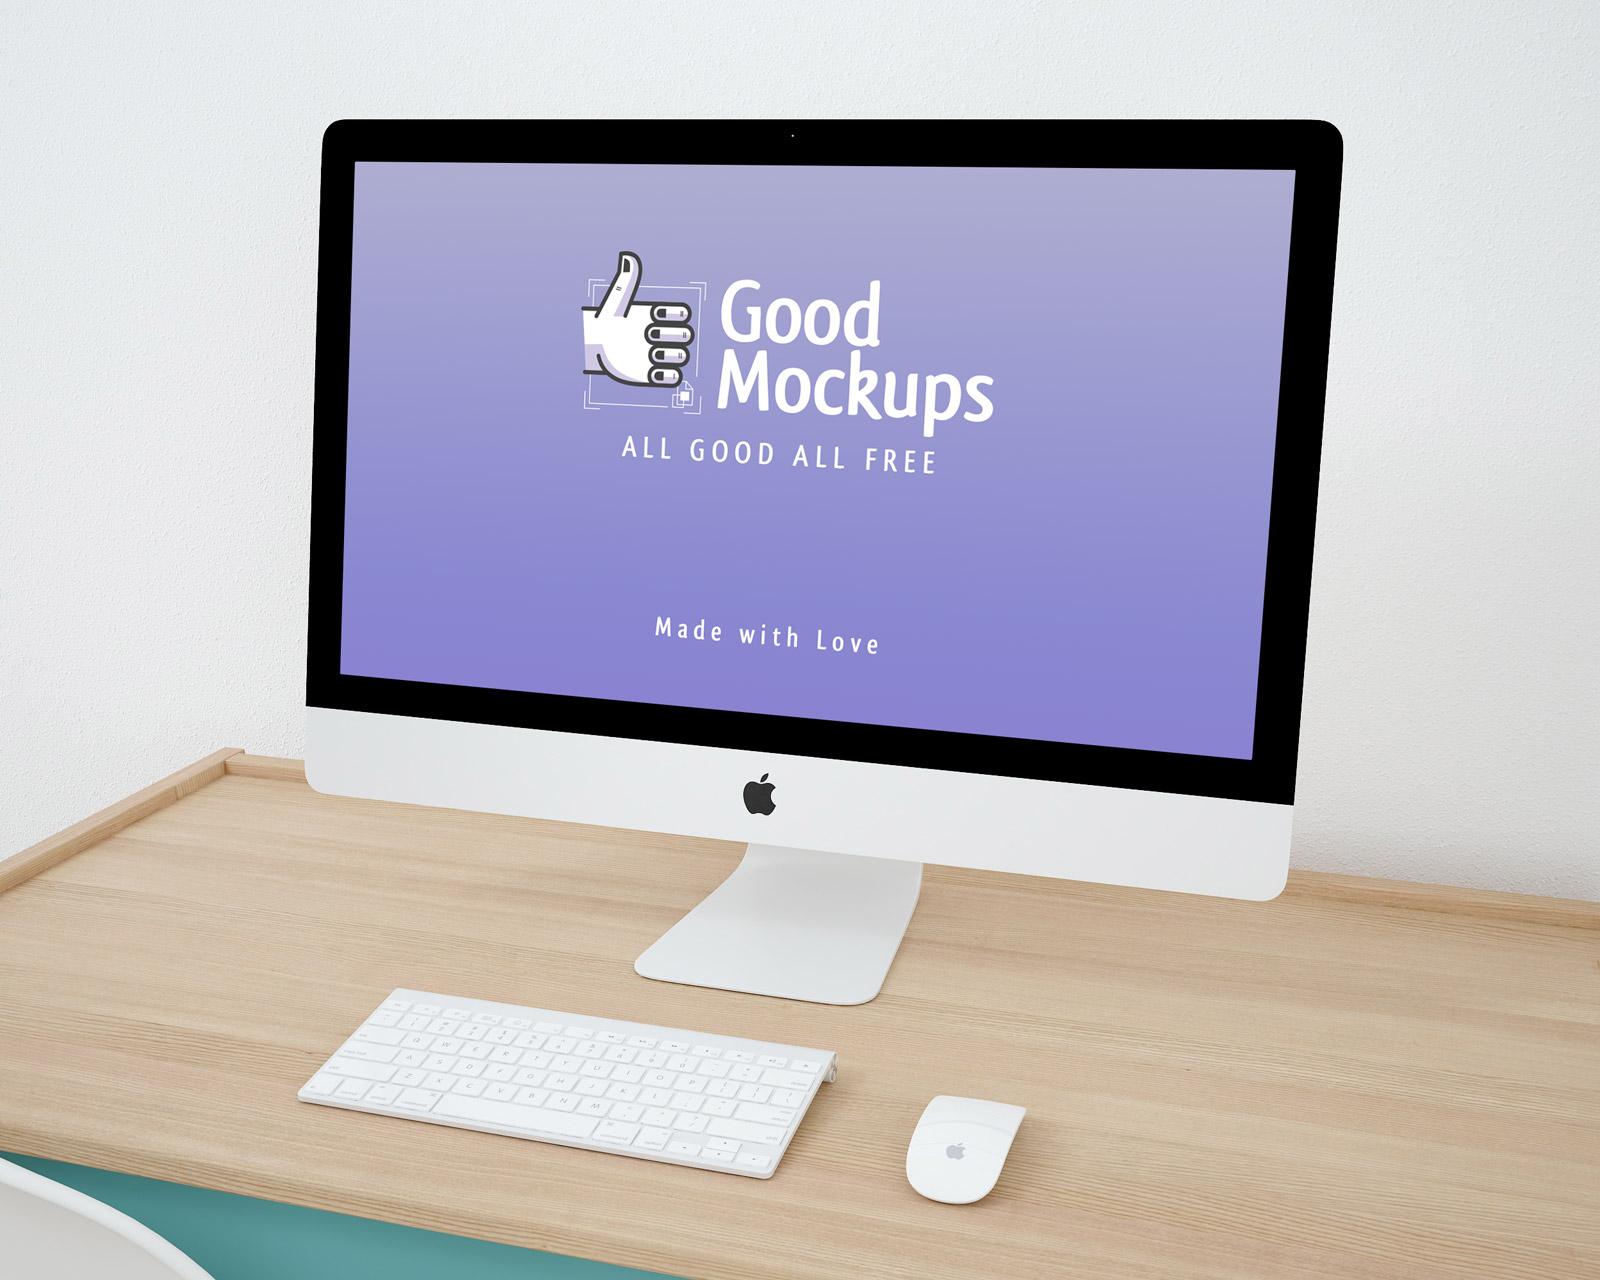 Free-Apple-iMac-Website-Template-Mock-up-PSD